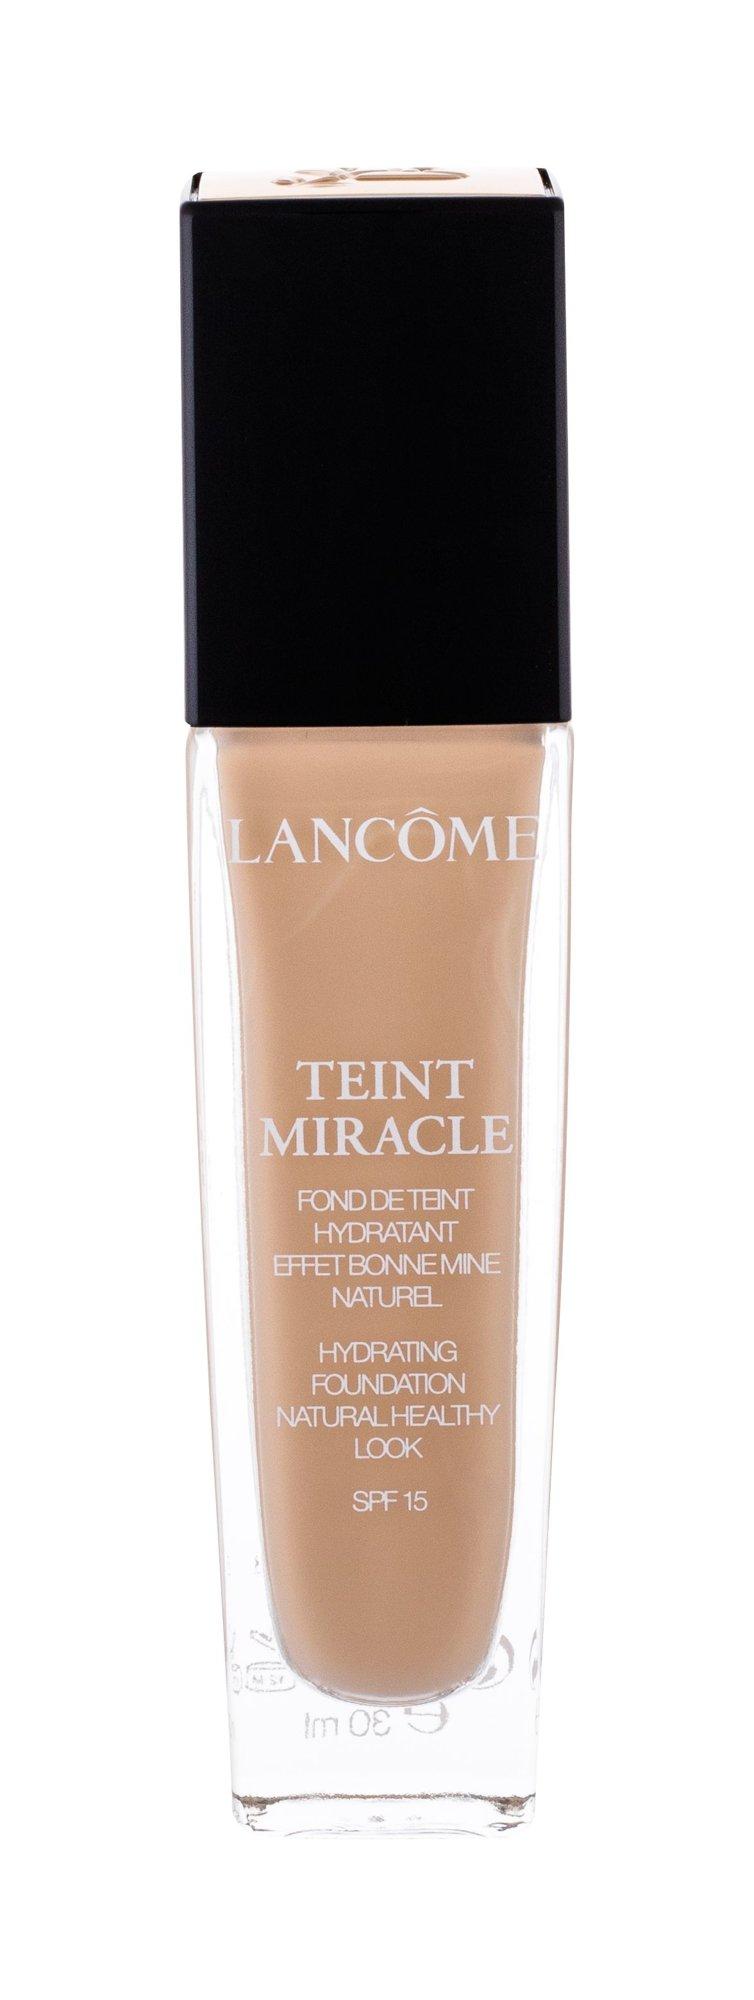 Lancôme Teint Miracle Makeup 30ml 02